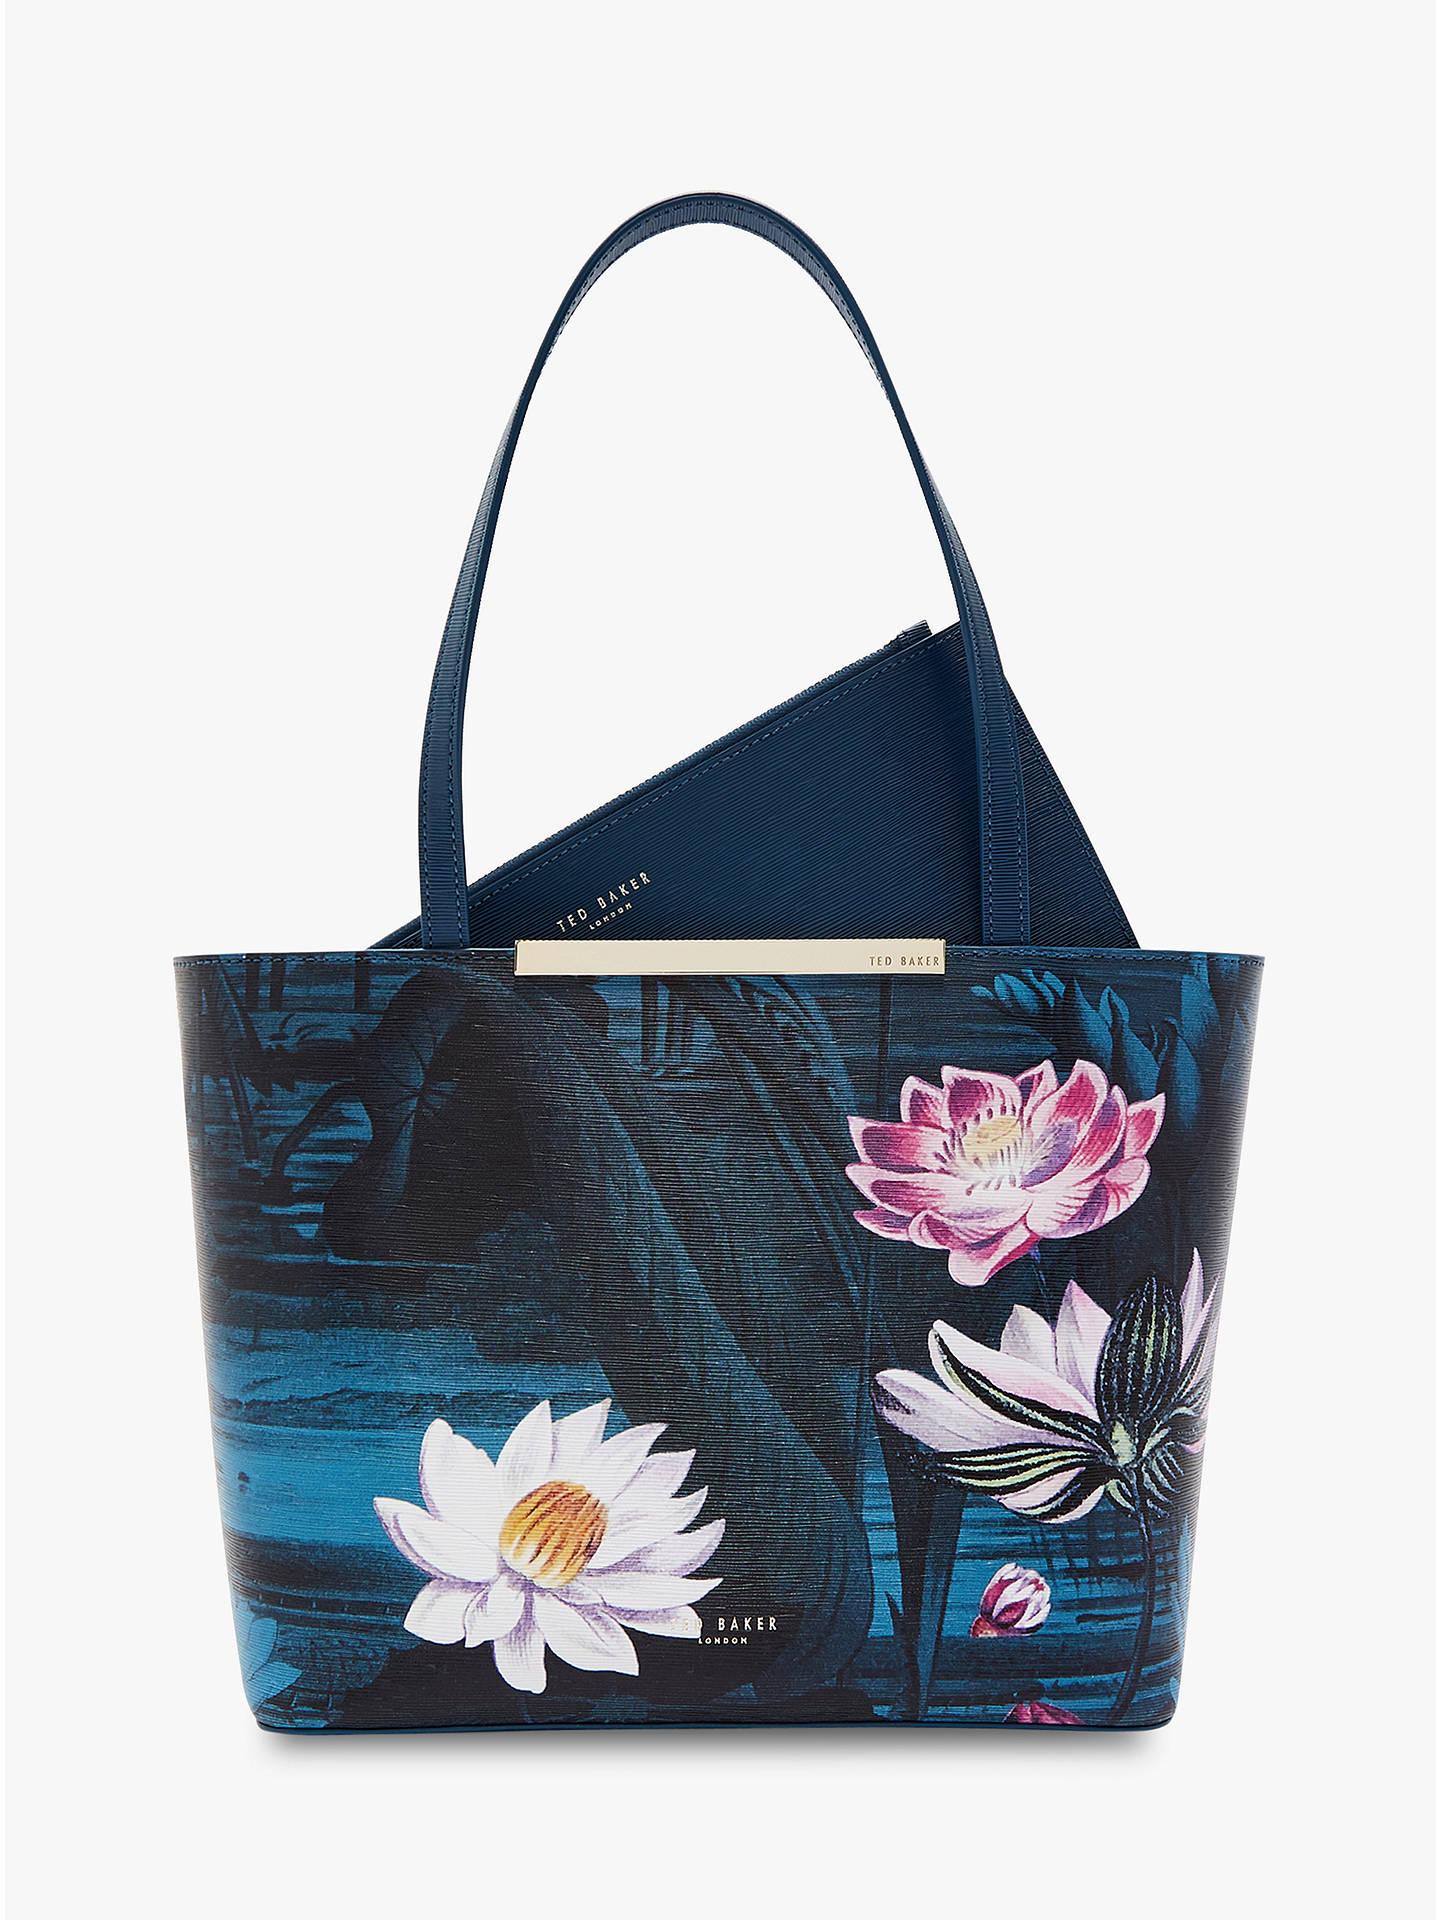 b42a31c7ee0e1 Buy Ted Baker Sirene Mini Shopper Bag, Blue Teal Online at johnlewis.com ...